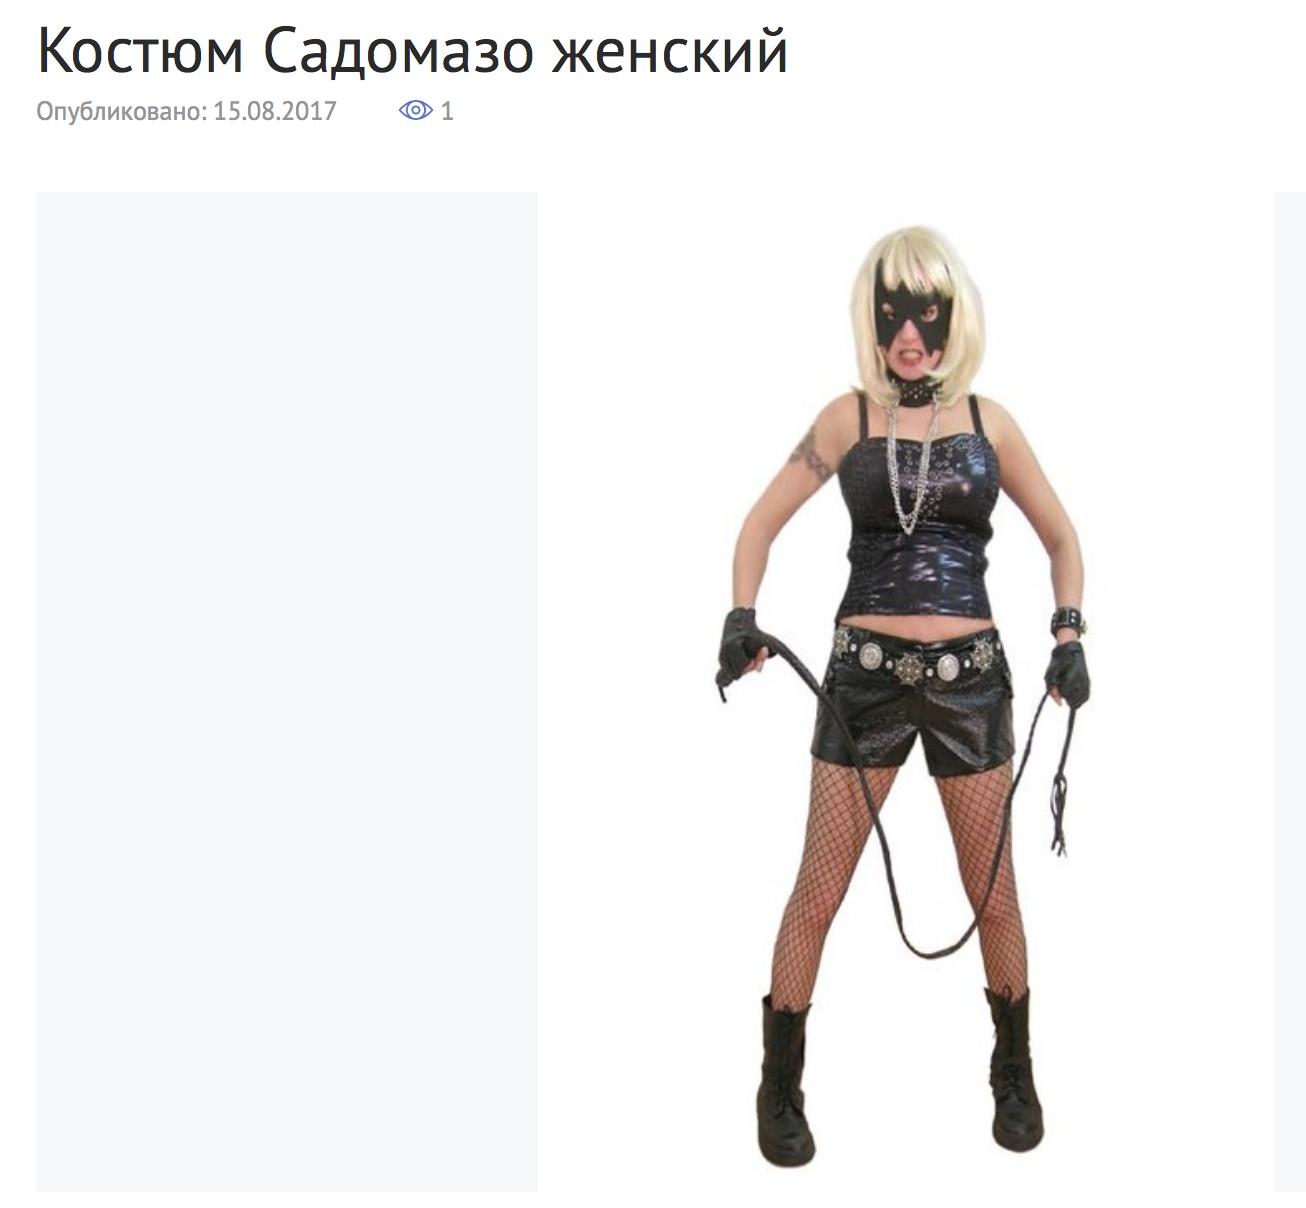 foto-devushka-v-kostyume-sado-mazo